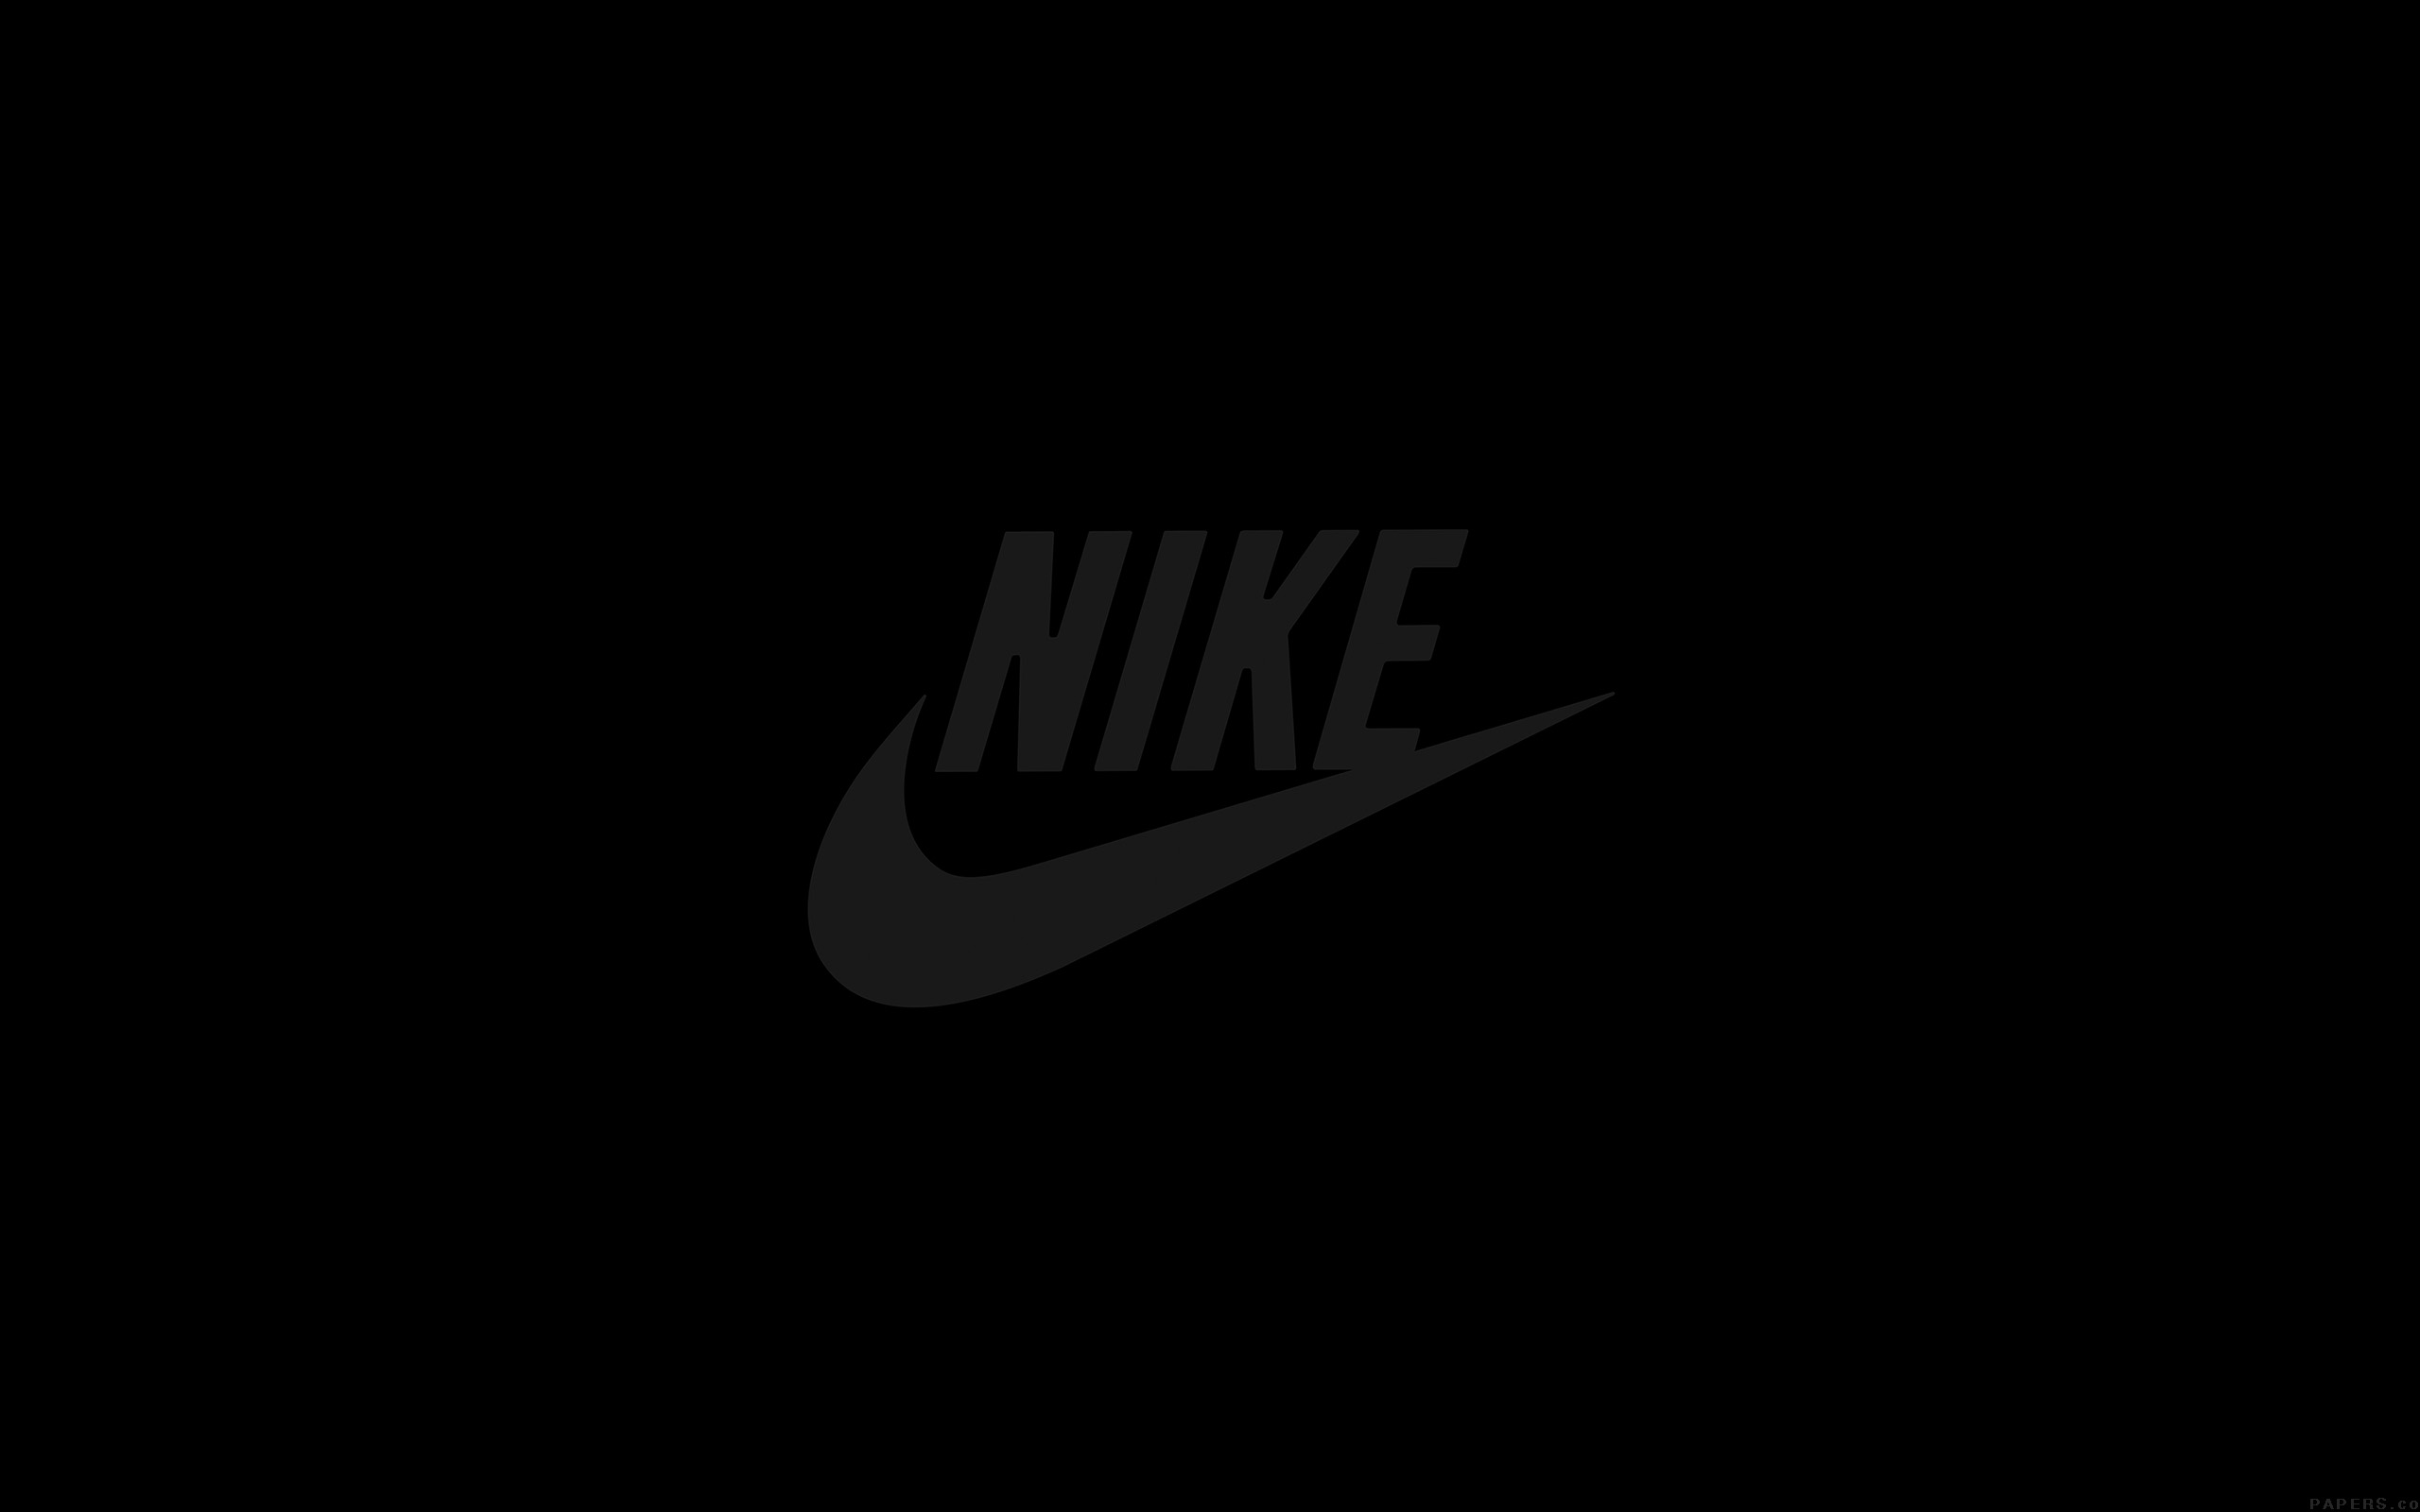 Al86 nike logo sports art minimal simple dark for Minimal art logo